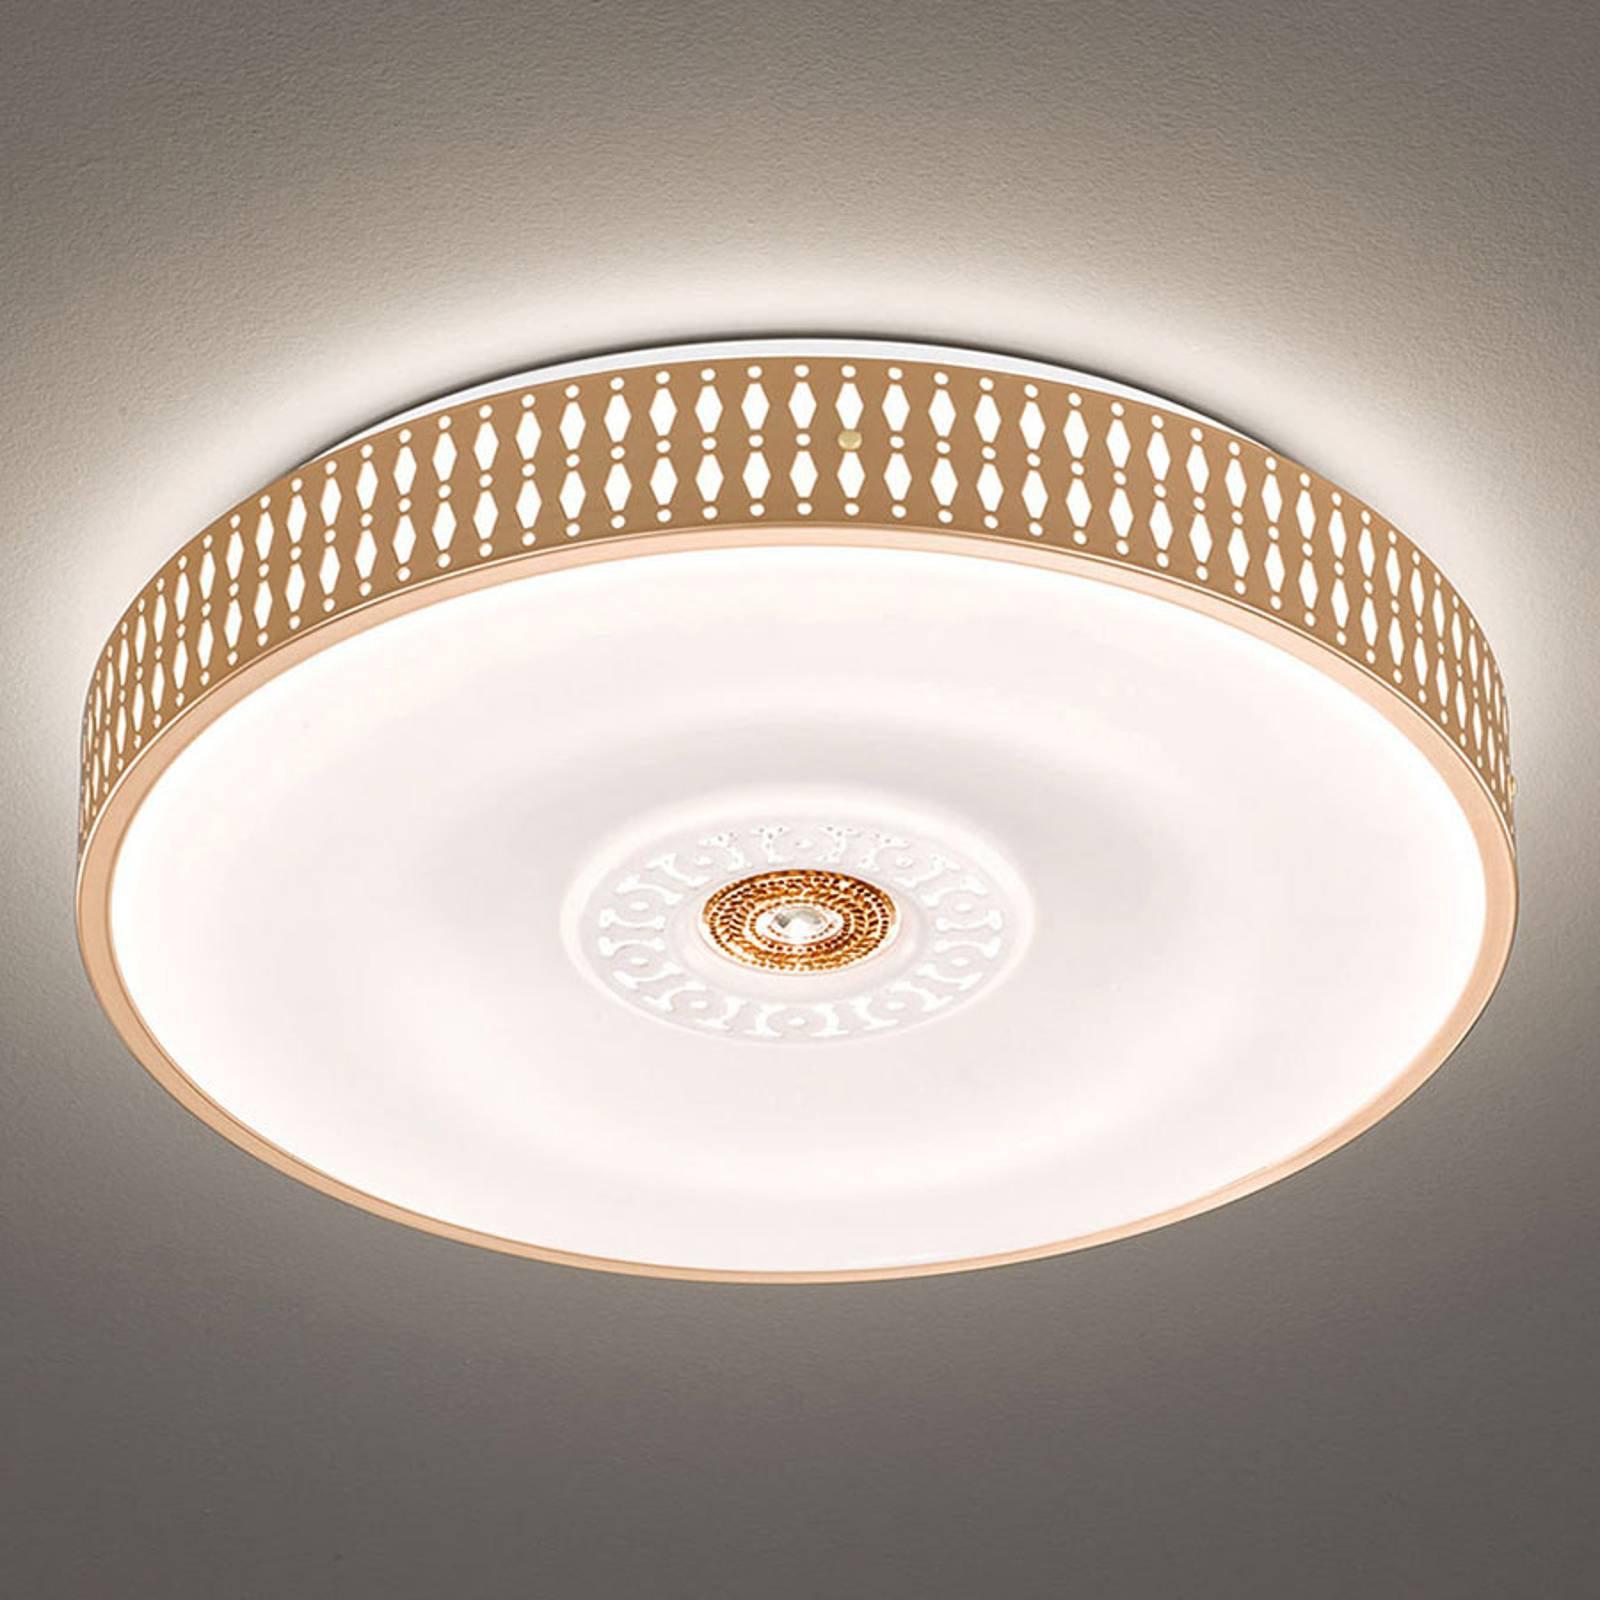 LED-taklampe Coso, dimbar, Ø 50 cm